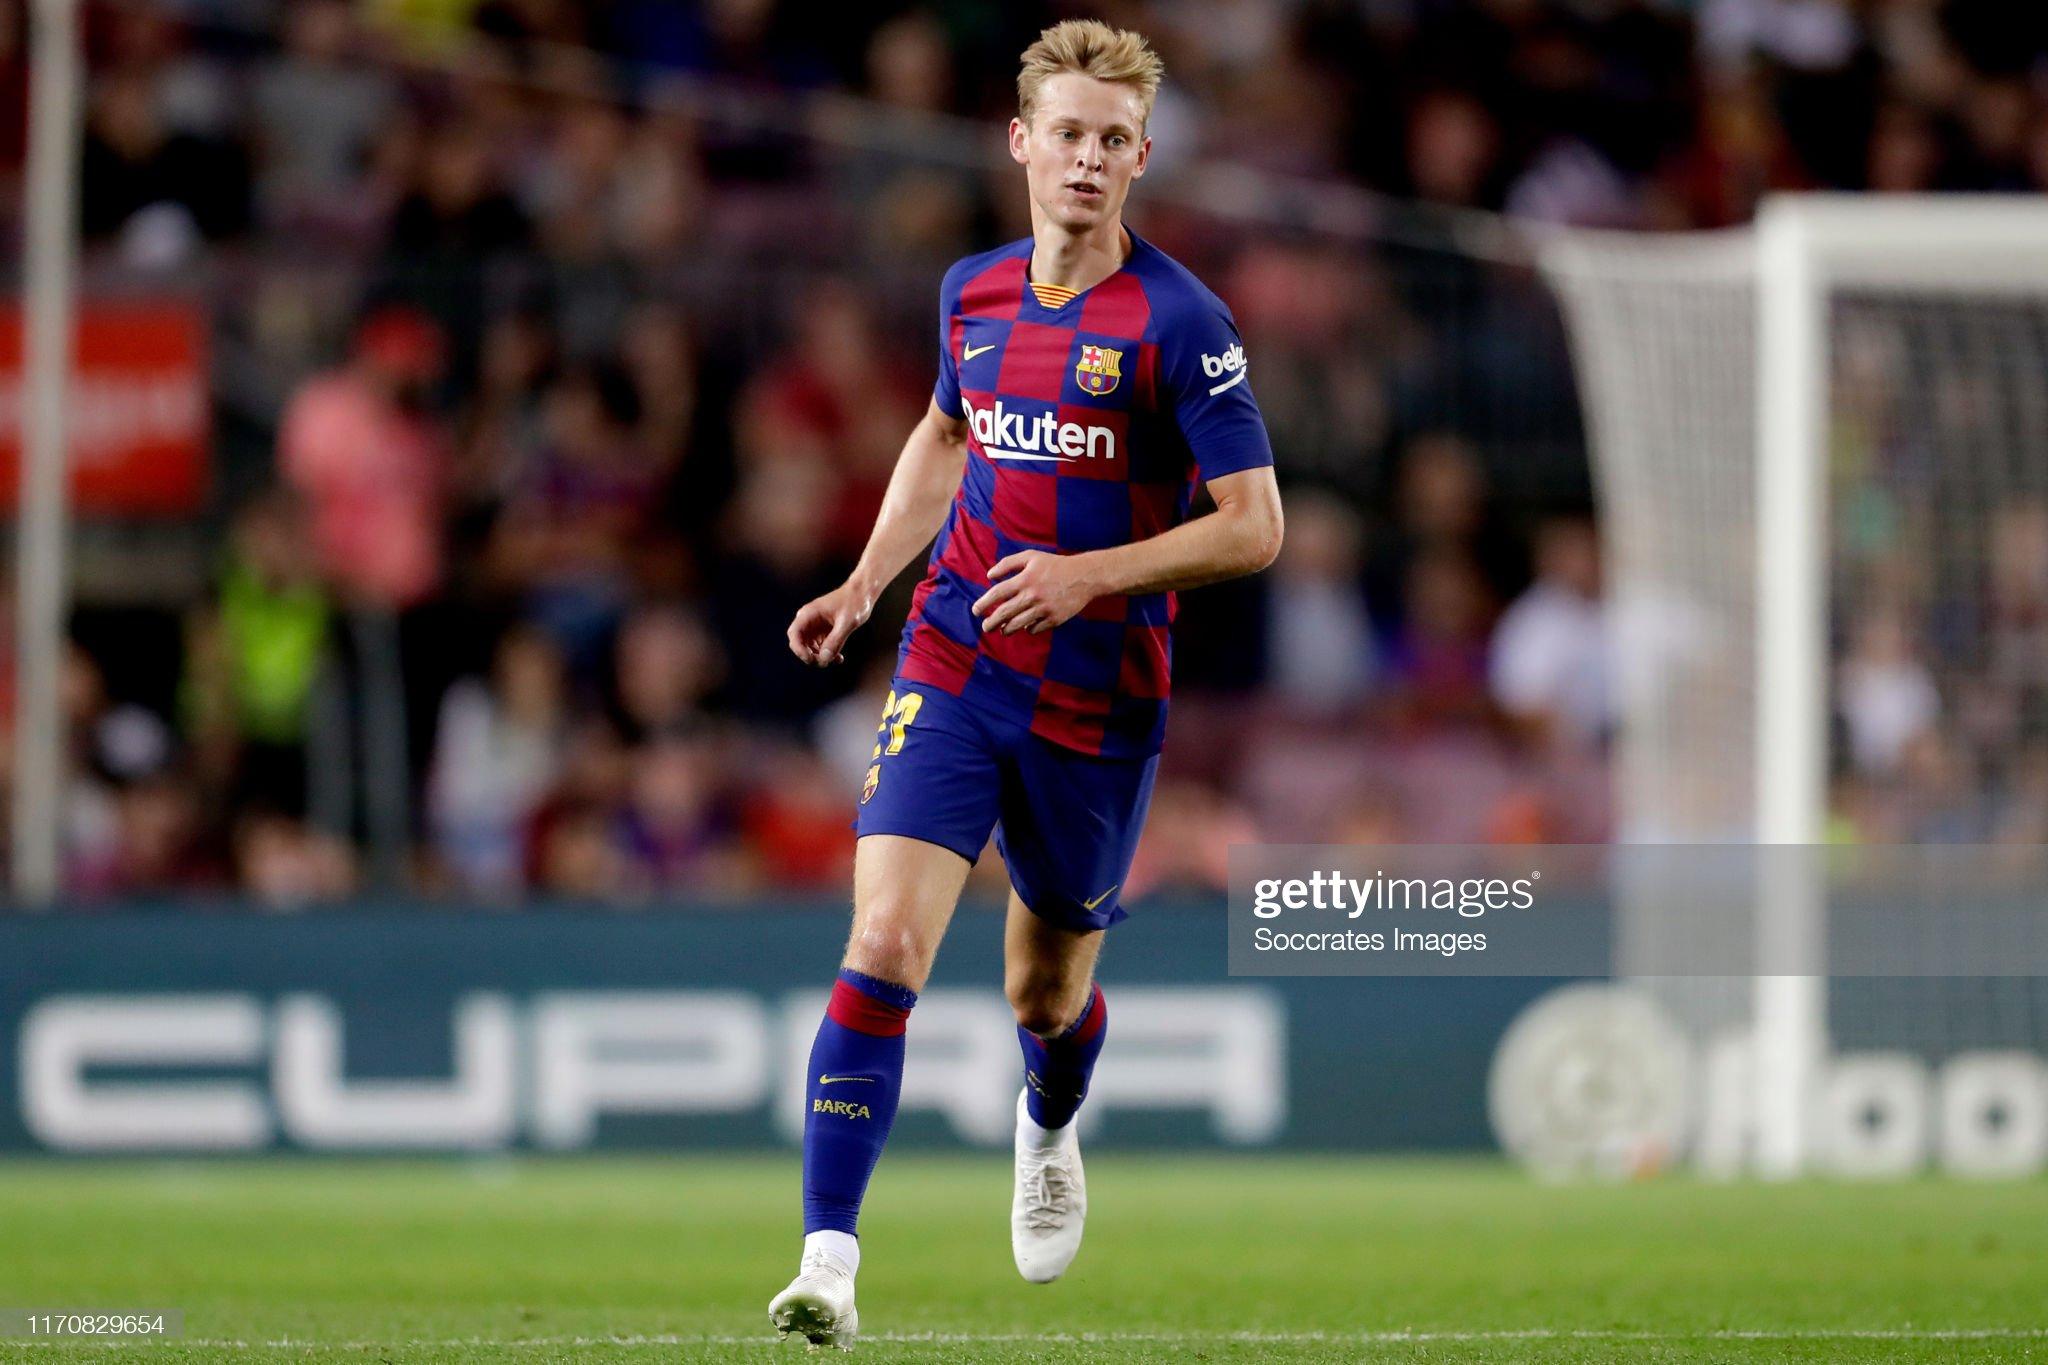 صور مباراة : برشلونة - فياريال 2-1 ( 24-09-2019 )  Frenkie-de-jong-of-fc-barcelona-during-the-la-liga-santander-match-picture-id1170829654?s=2048x2048